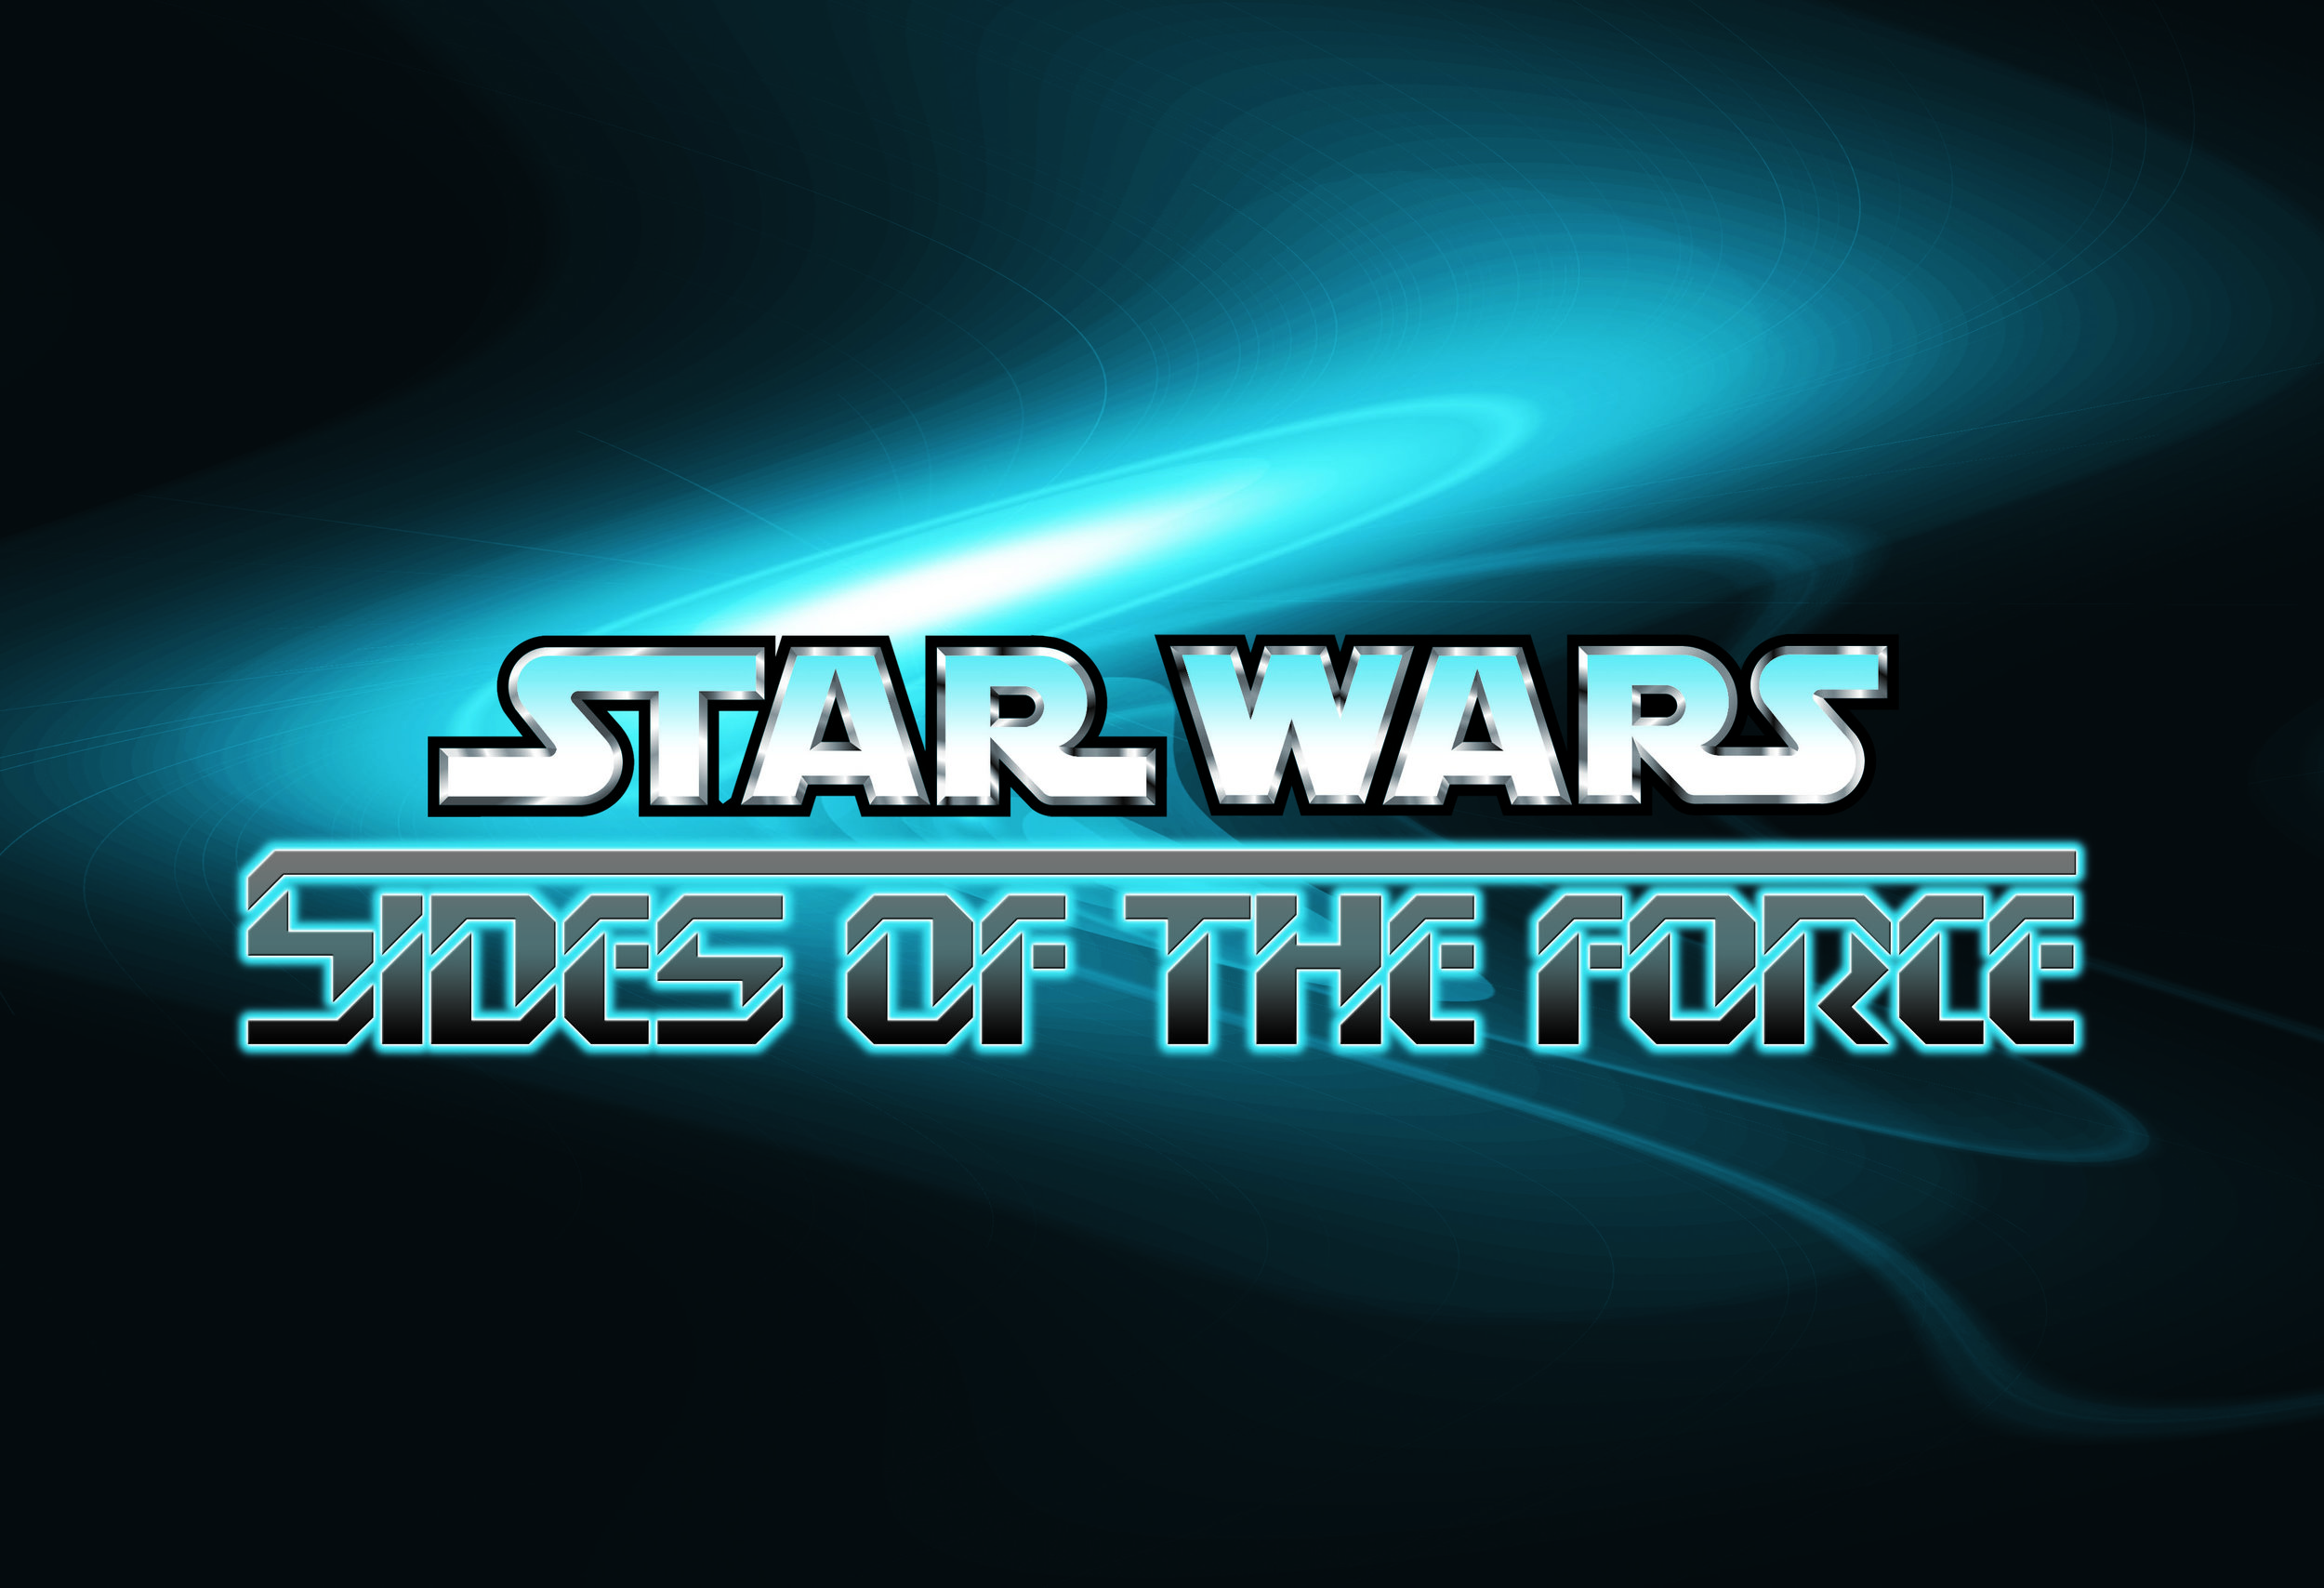 starwarssidesoftheforce.jpg